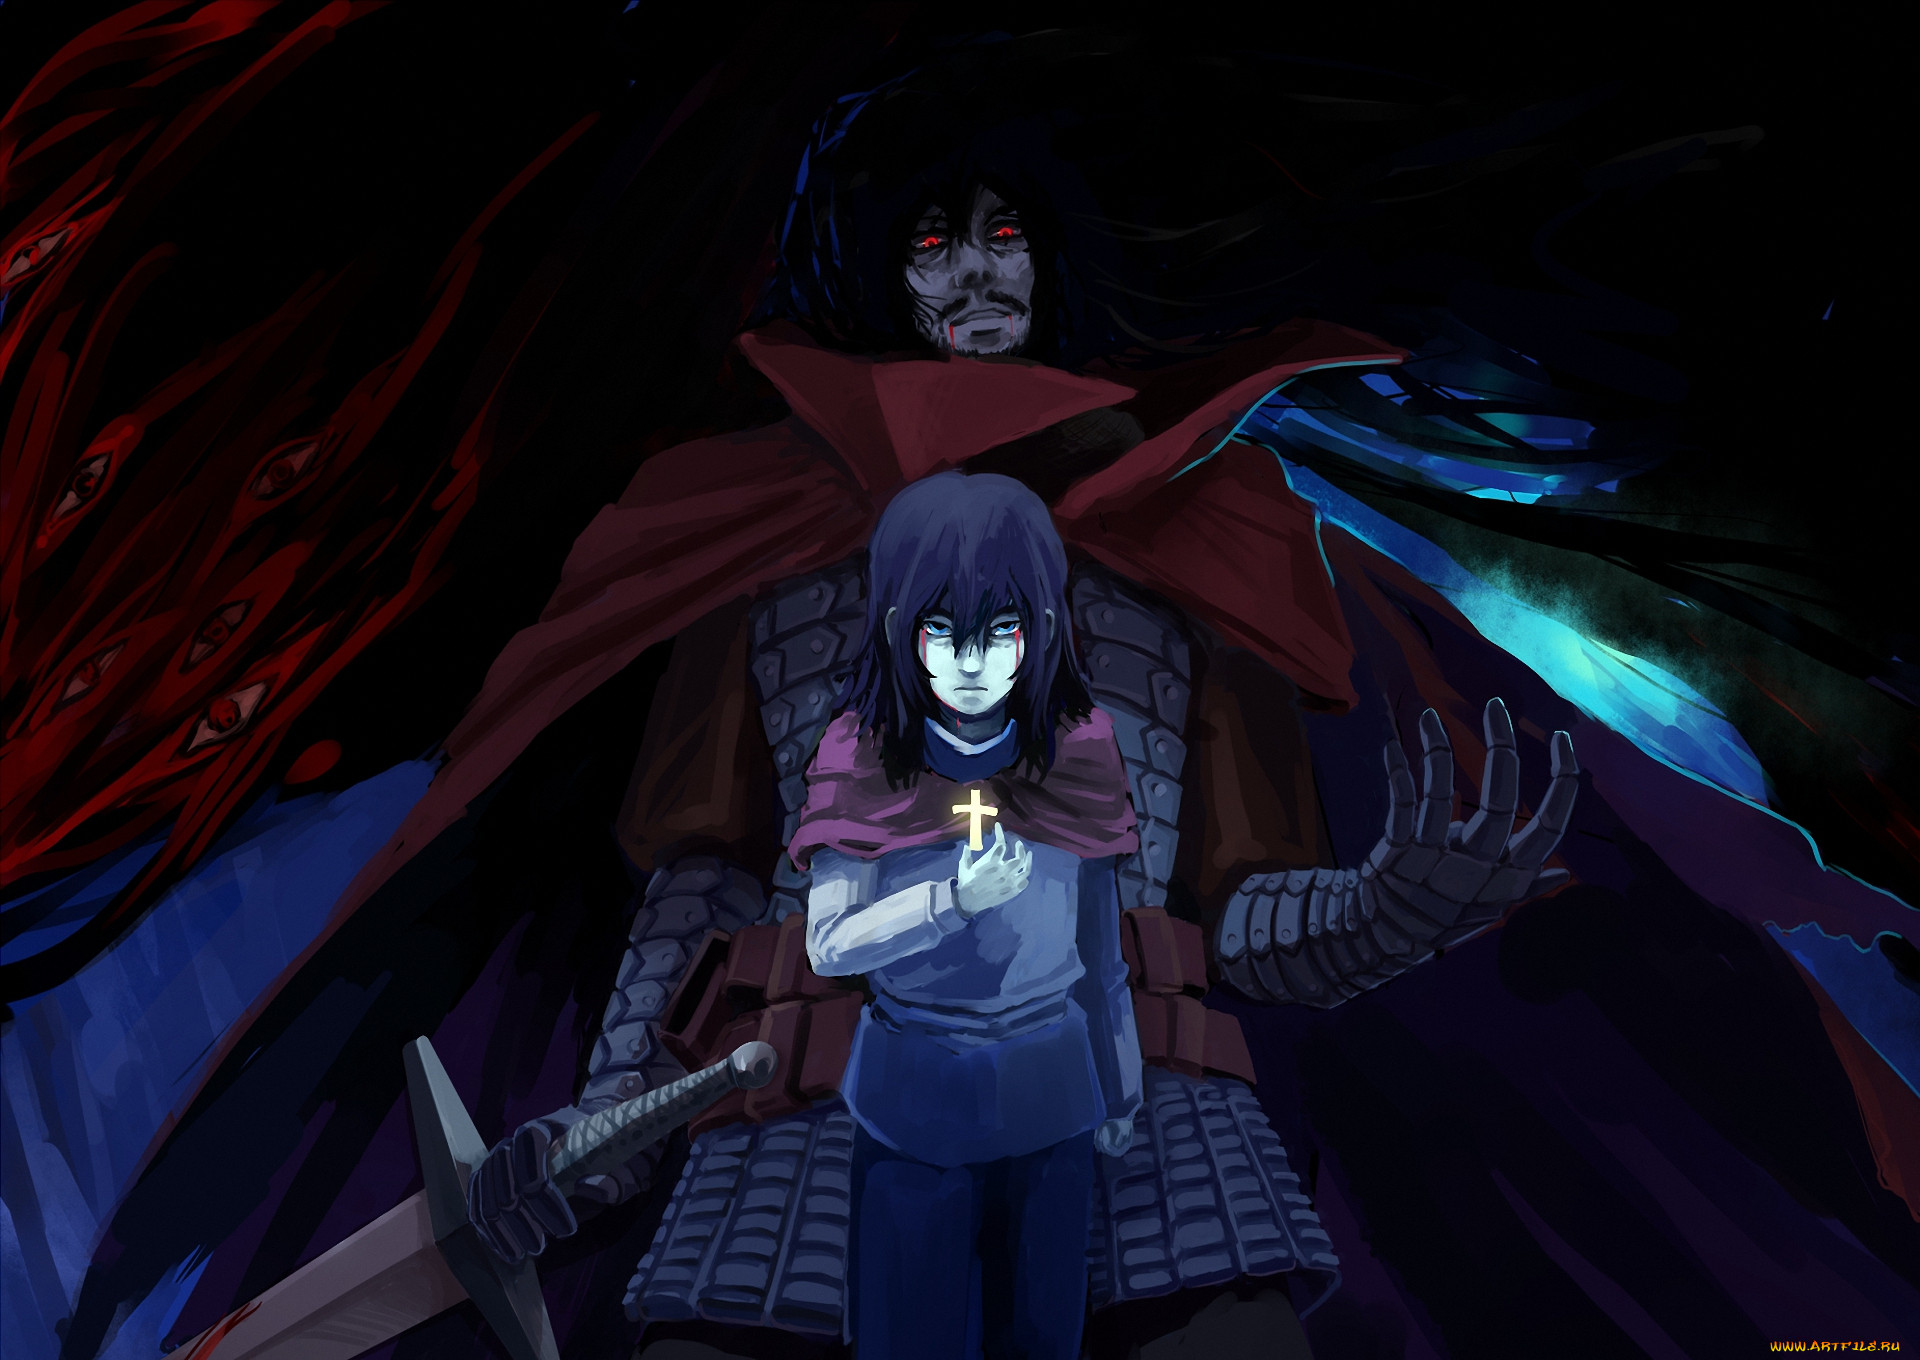 аниме, hellsing, плащ, dracula, alucard, vampire, демон, парень, мужчина, меч, крест